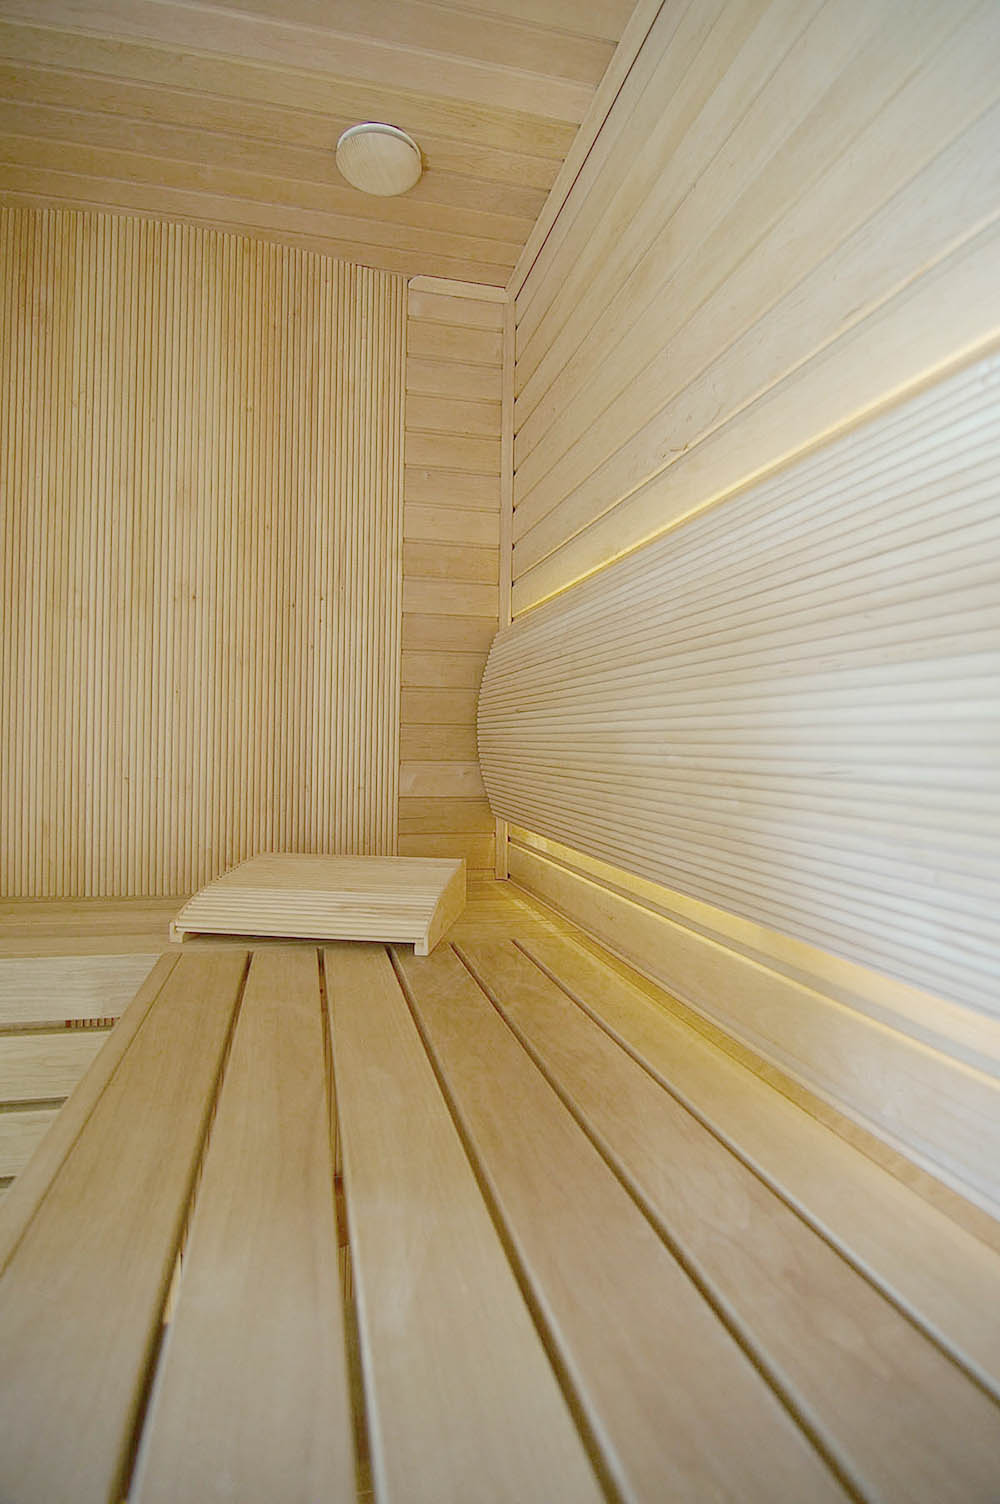 1209634249---finnish-sauna-steam-hamam-bath-russian-sauna-heaters-saunainter-com-saunamaailm